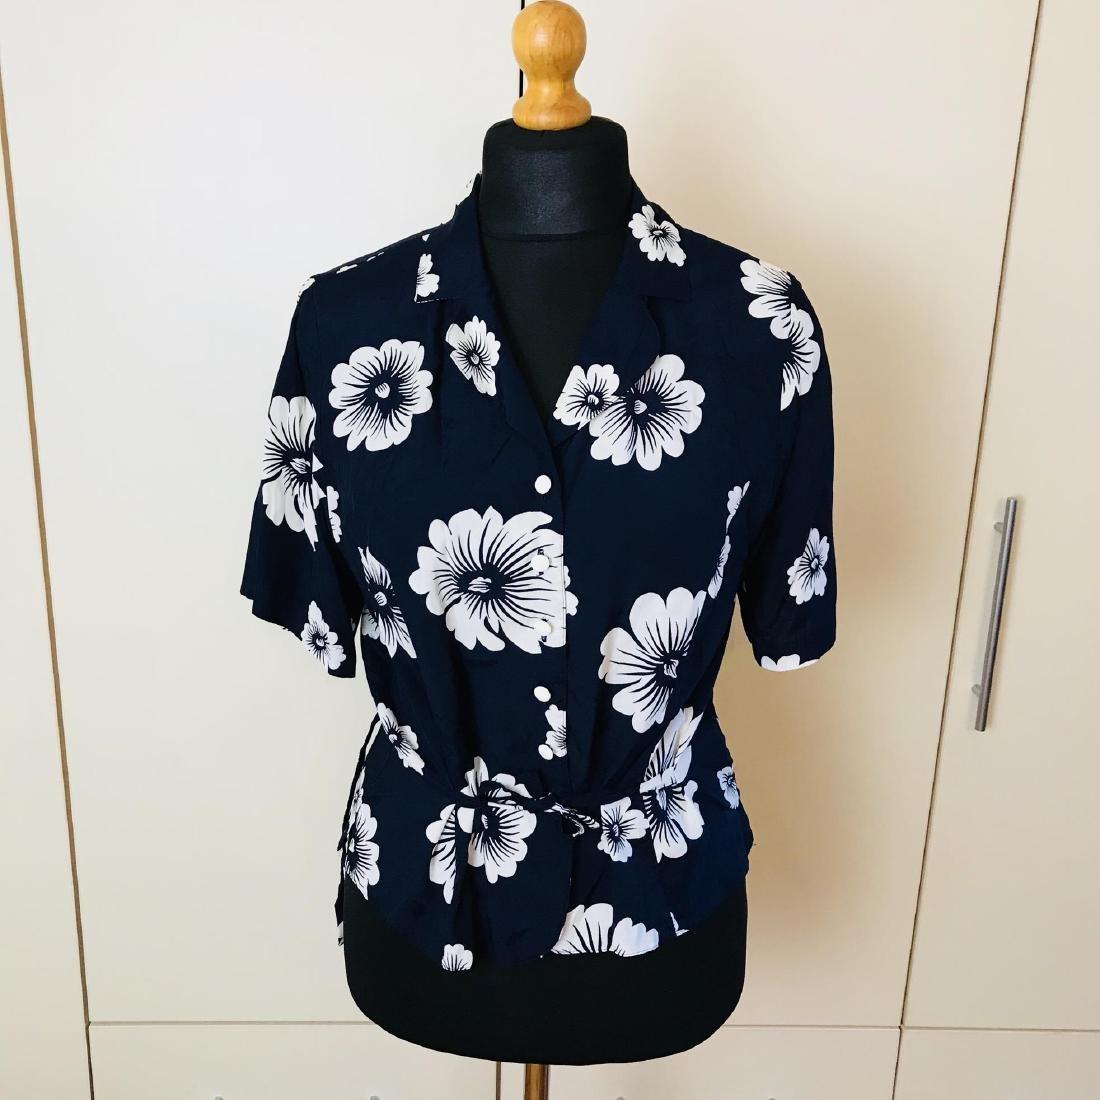 Vintage Women's Navy Blue Blouse Shirt Top